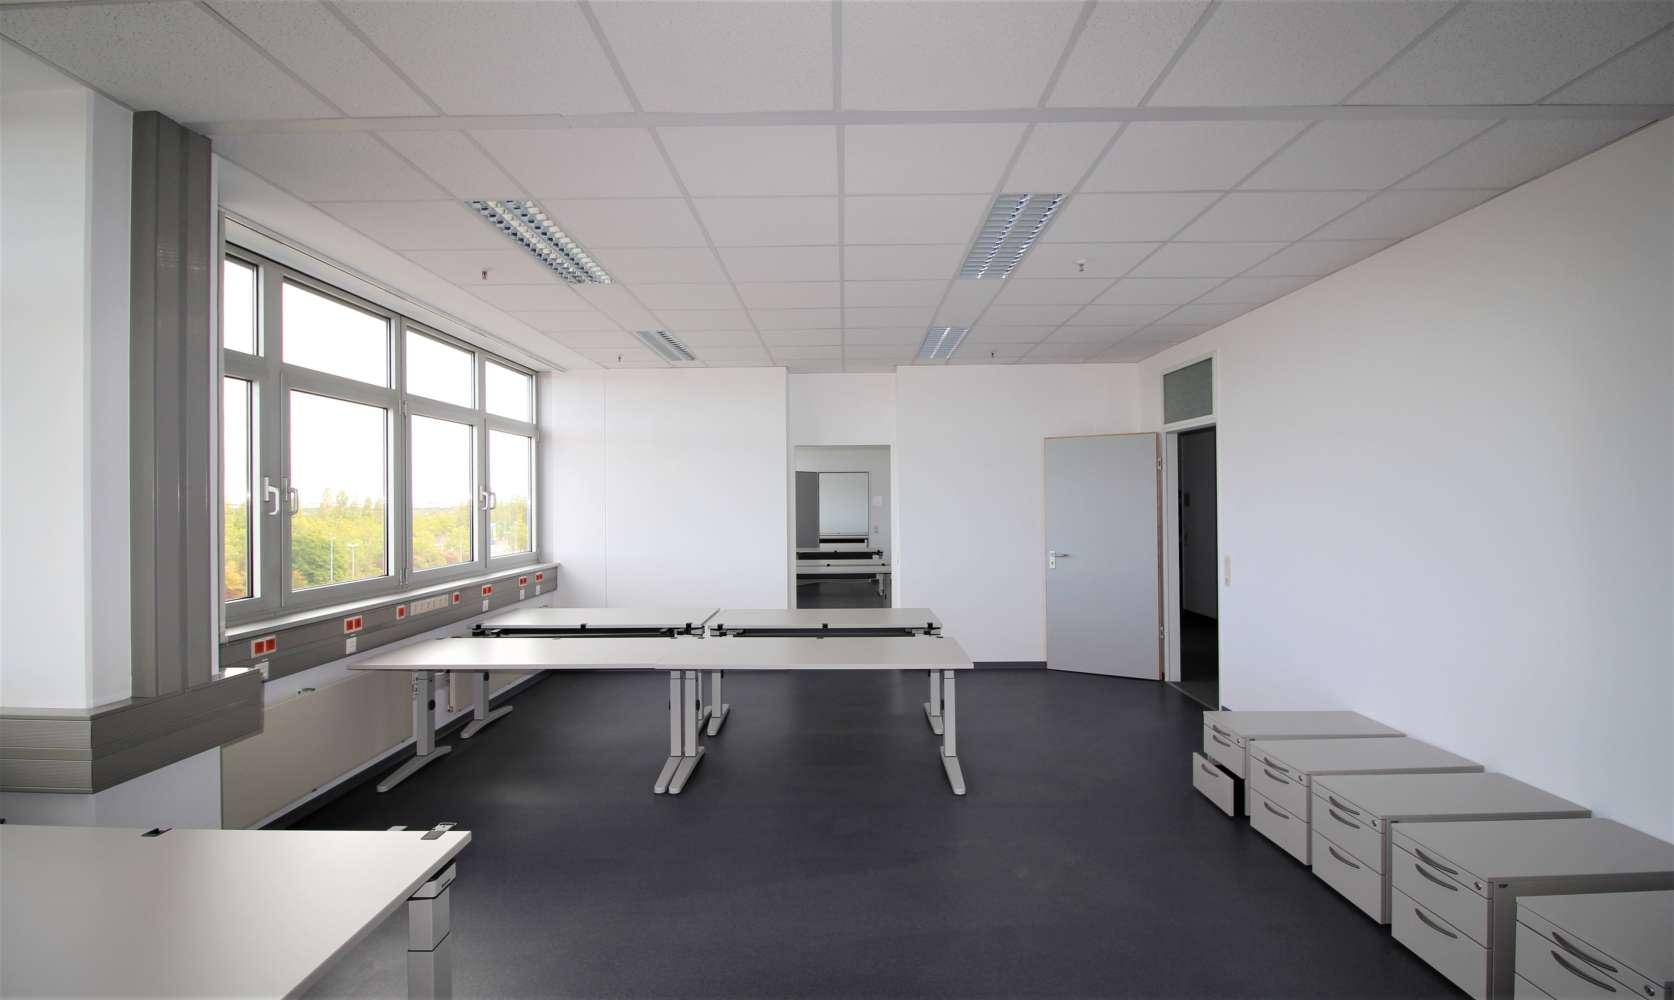 Büros Leipzig, 04356 - Büro - Leipzig, Seehausen - B1693 - 10041967